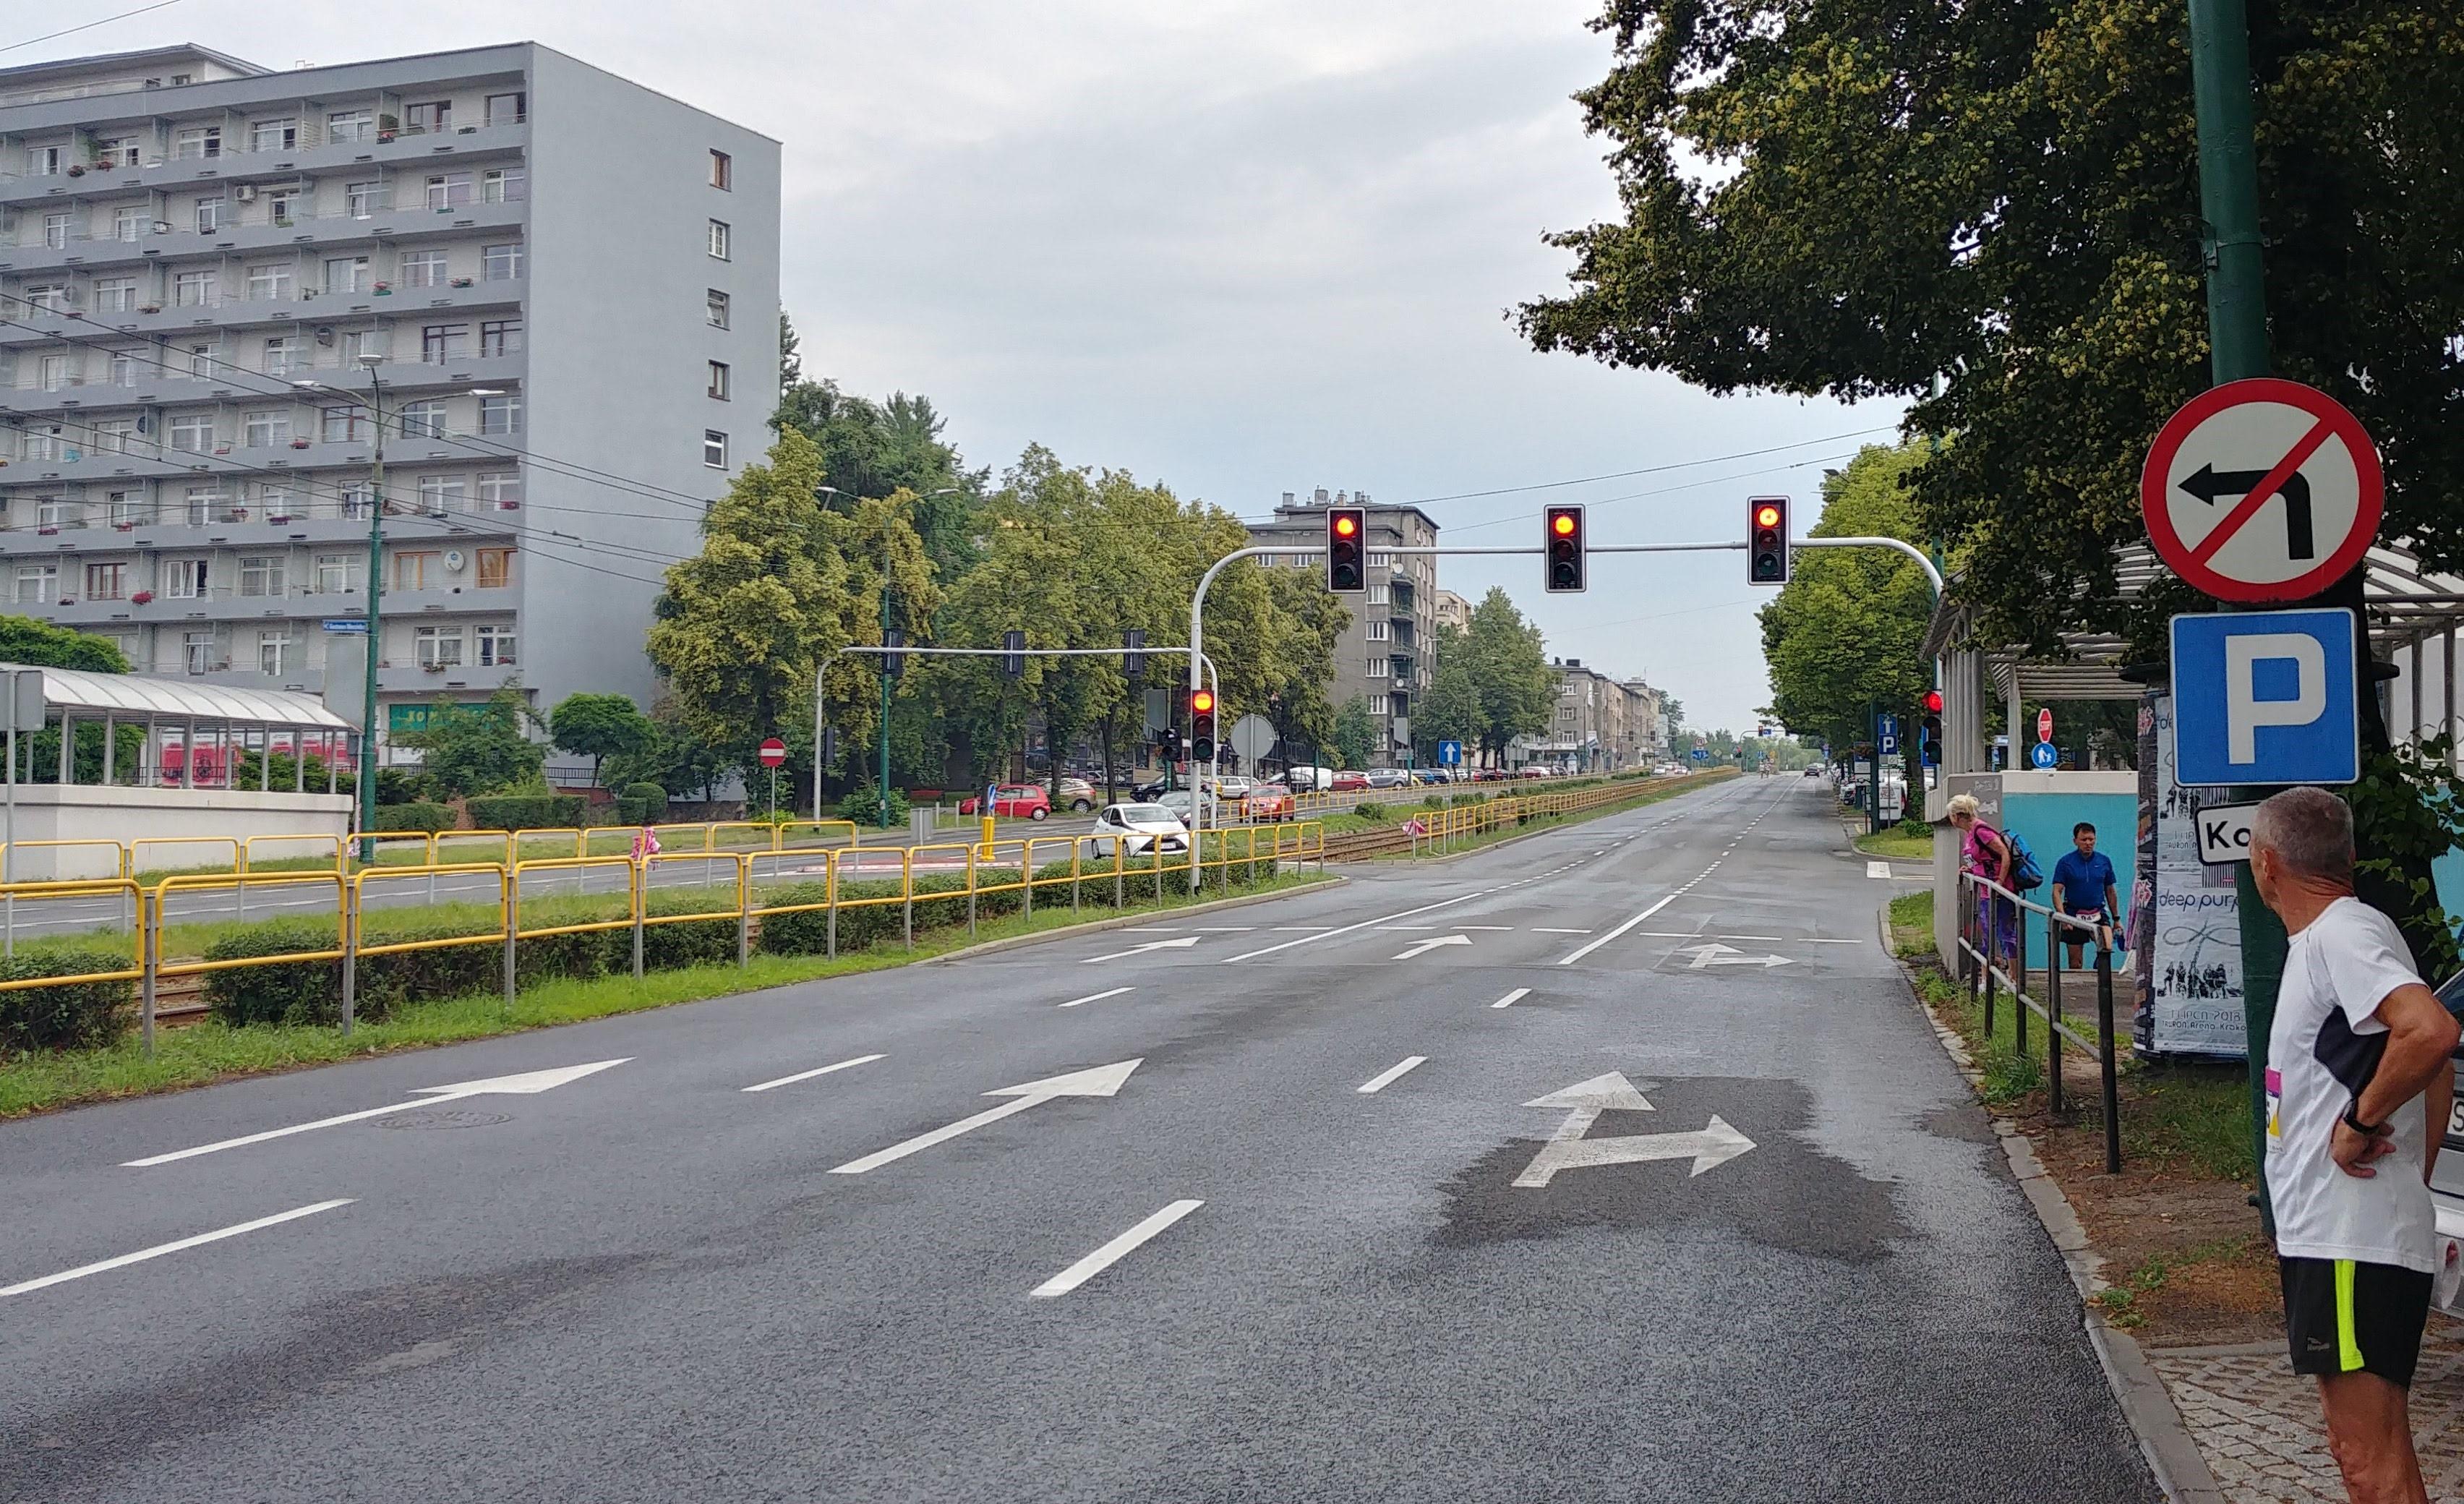 podibeg na Korfantego Wizz air Katowice Half Marathon